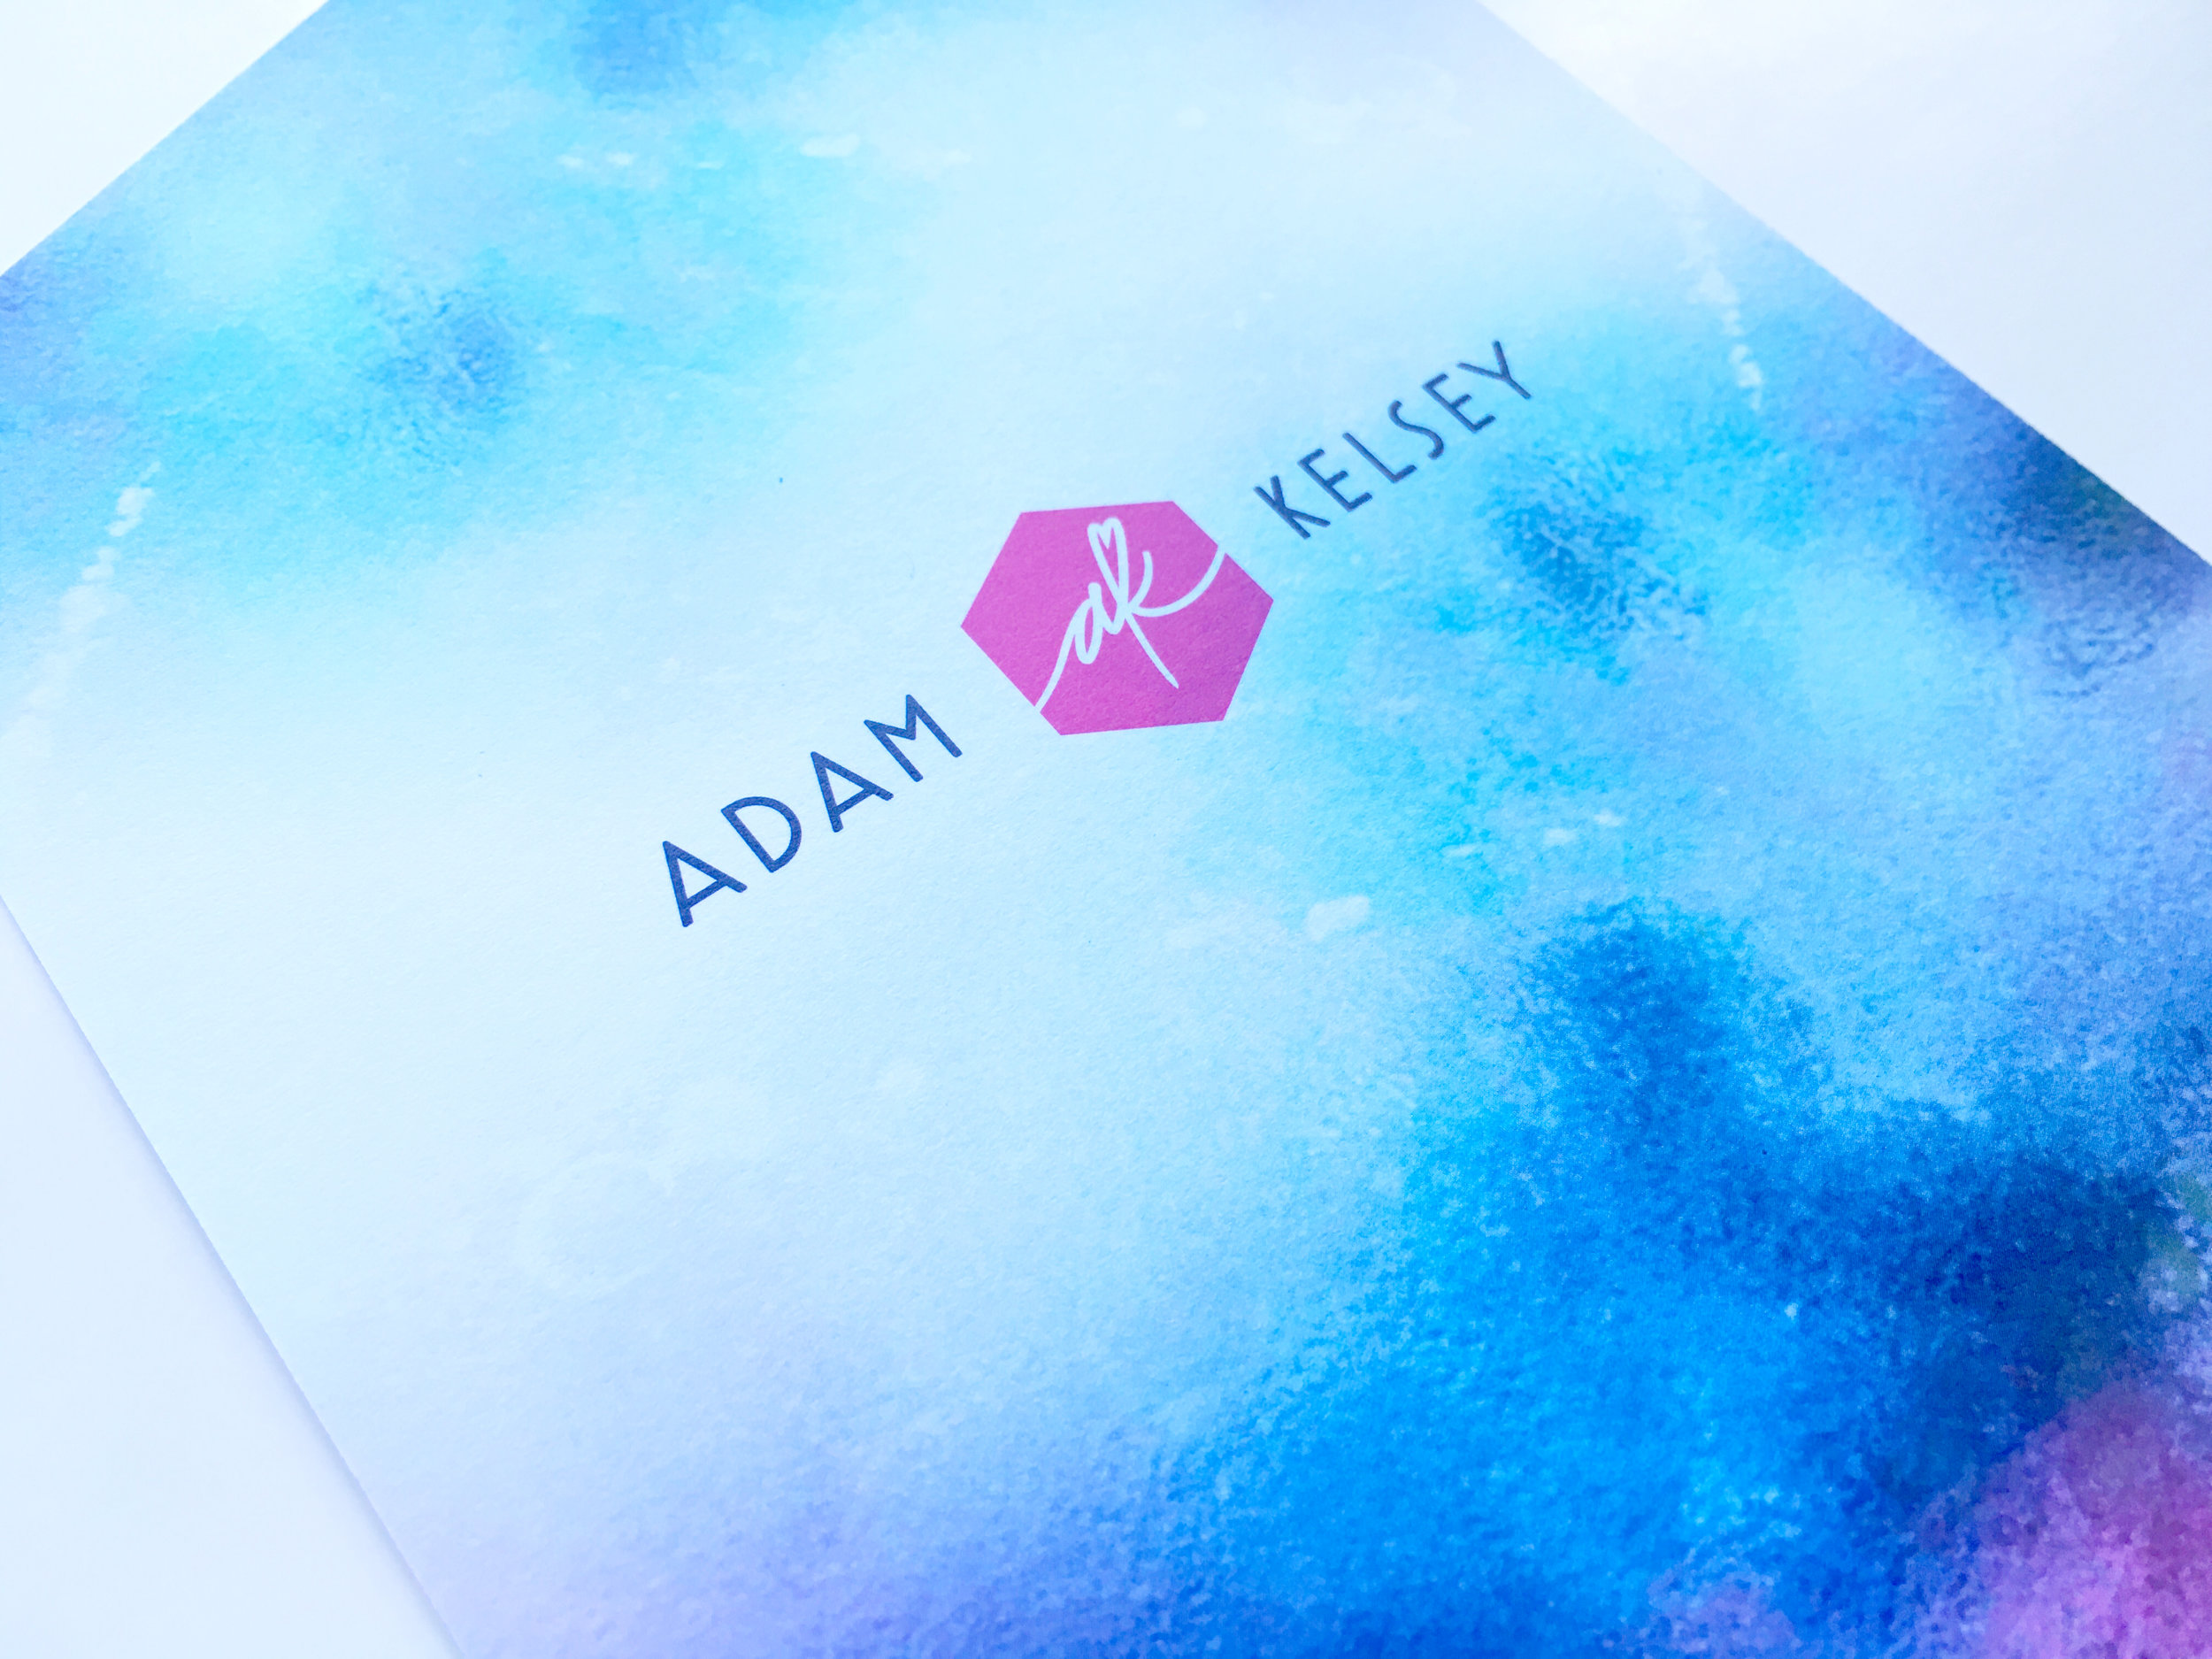 Kelsey and Adam Whimsical Wedding Invite Emblem